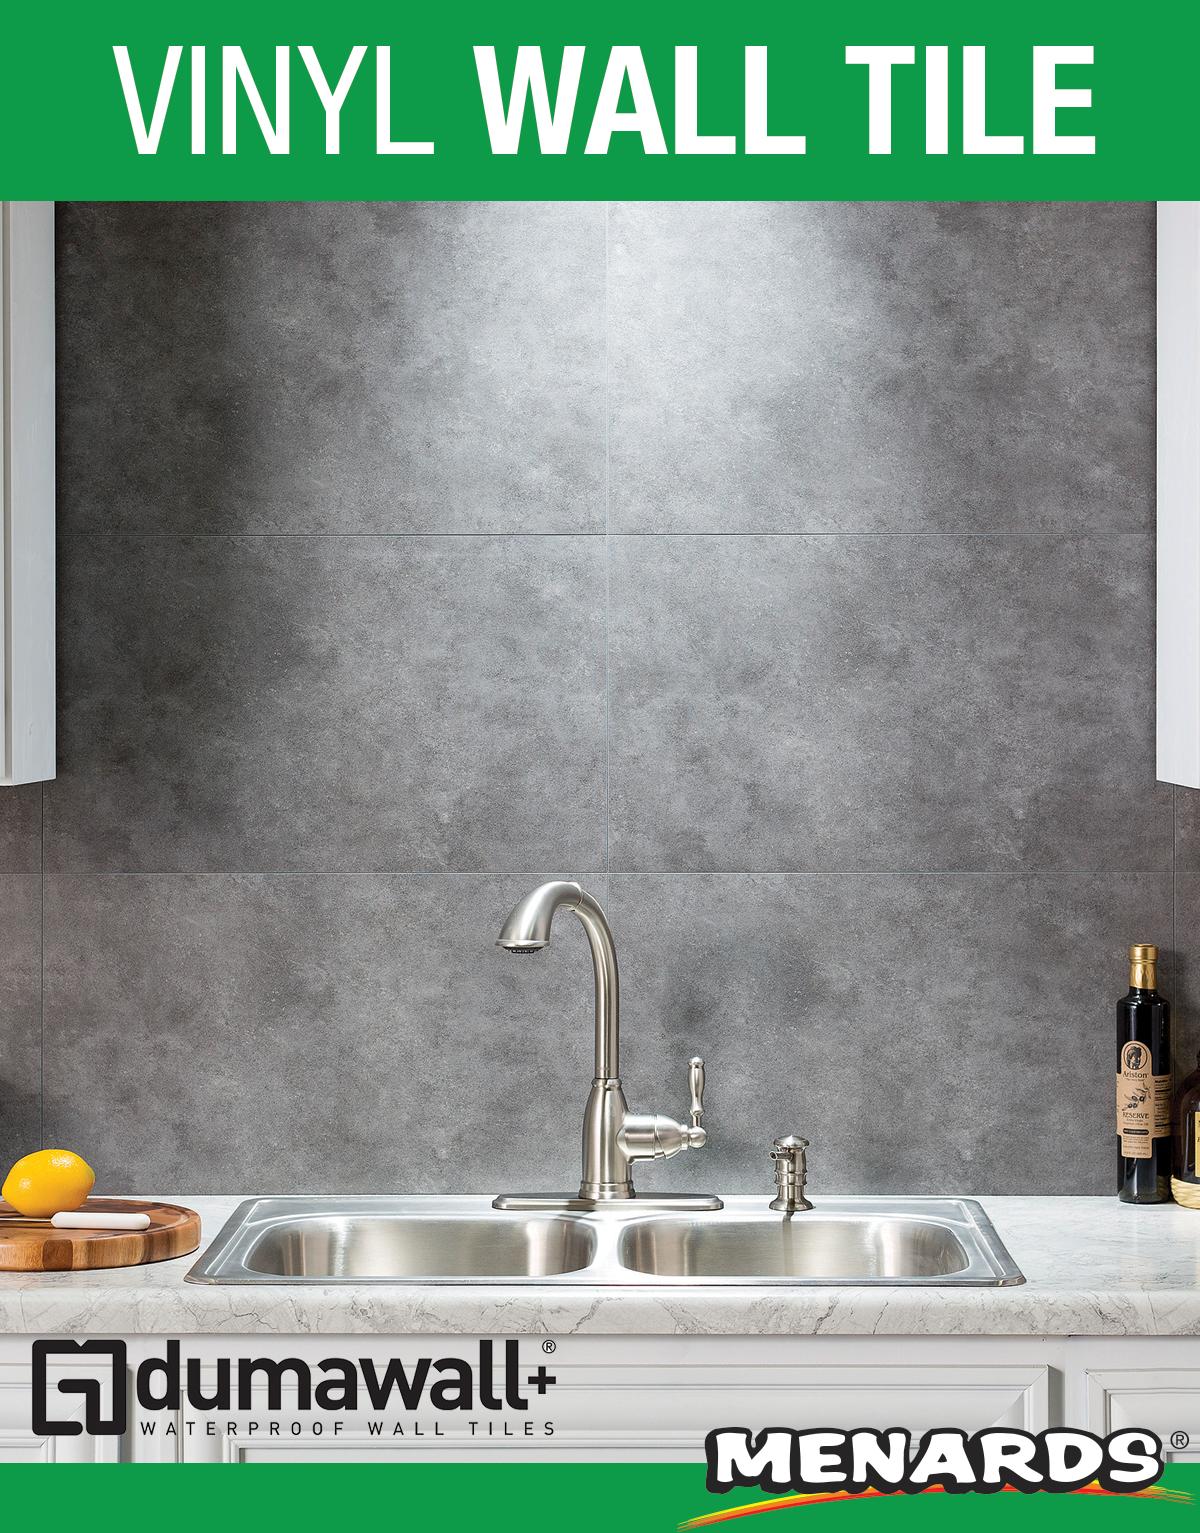 Dumawall Smoked Steel Vinyl Wall Tile 8 Pack In 2020 Stick On Tiles Vinyl Wall Tiles Peel And Stick Tile